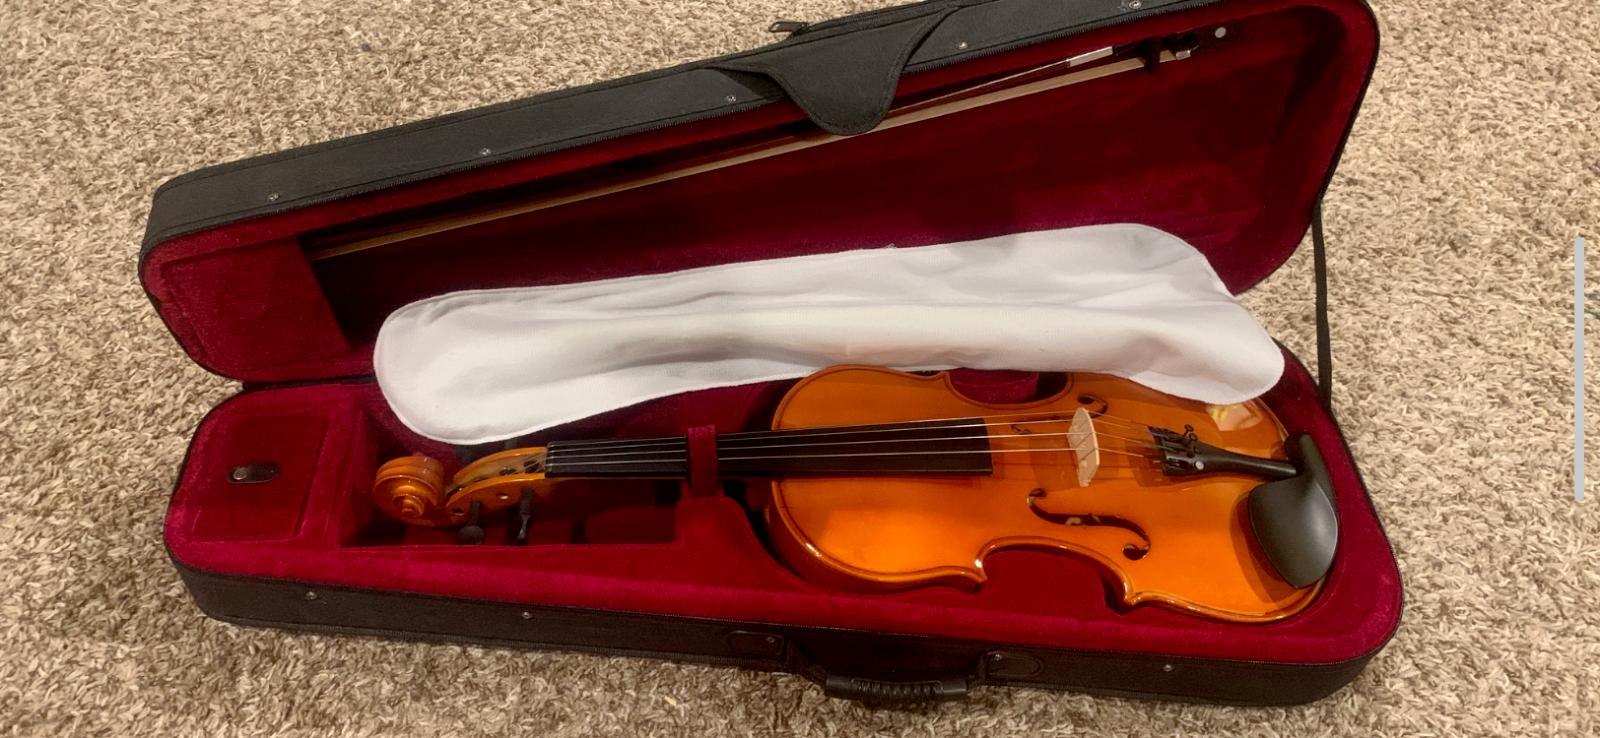 NEW Mendini Viola 4/4 Full Size - PRICE REDUCTION - $60.00